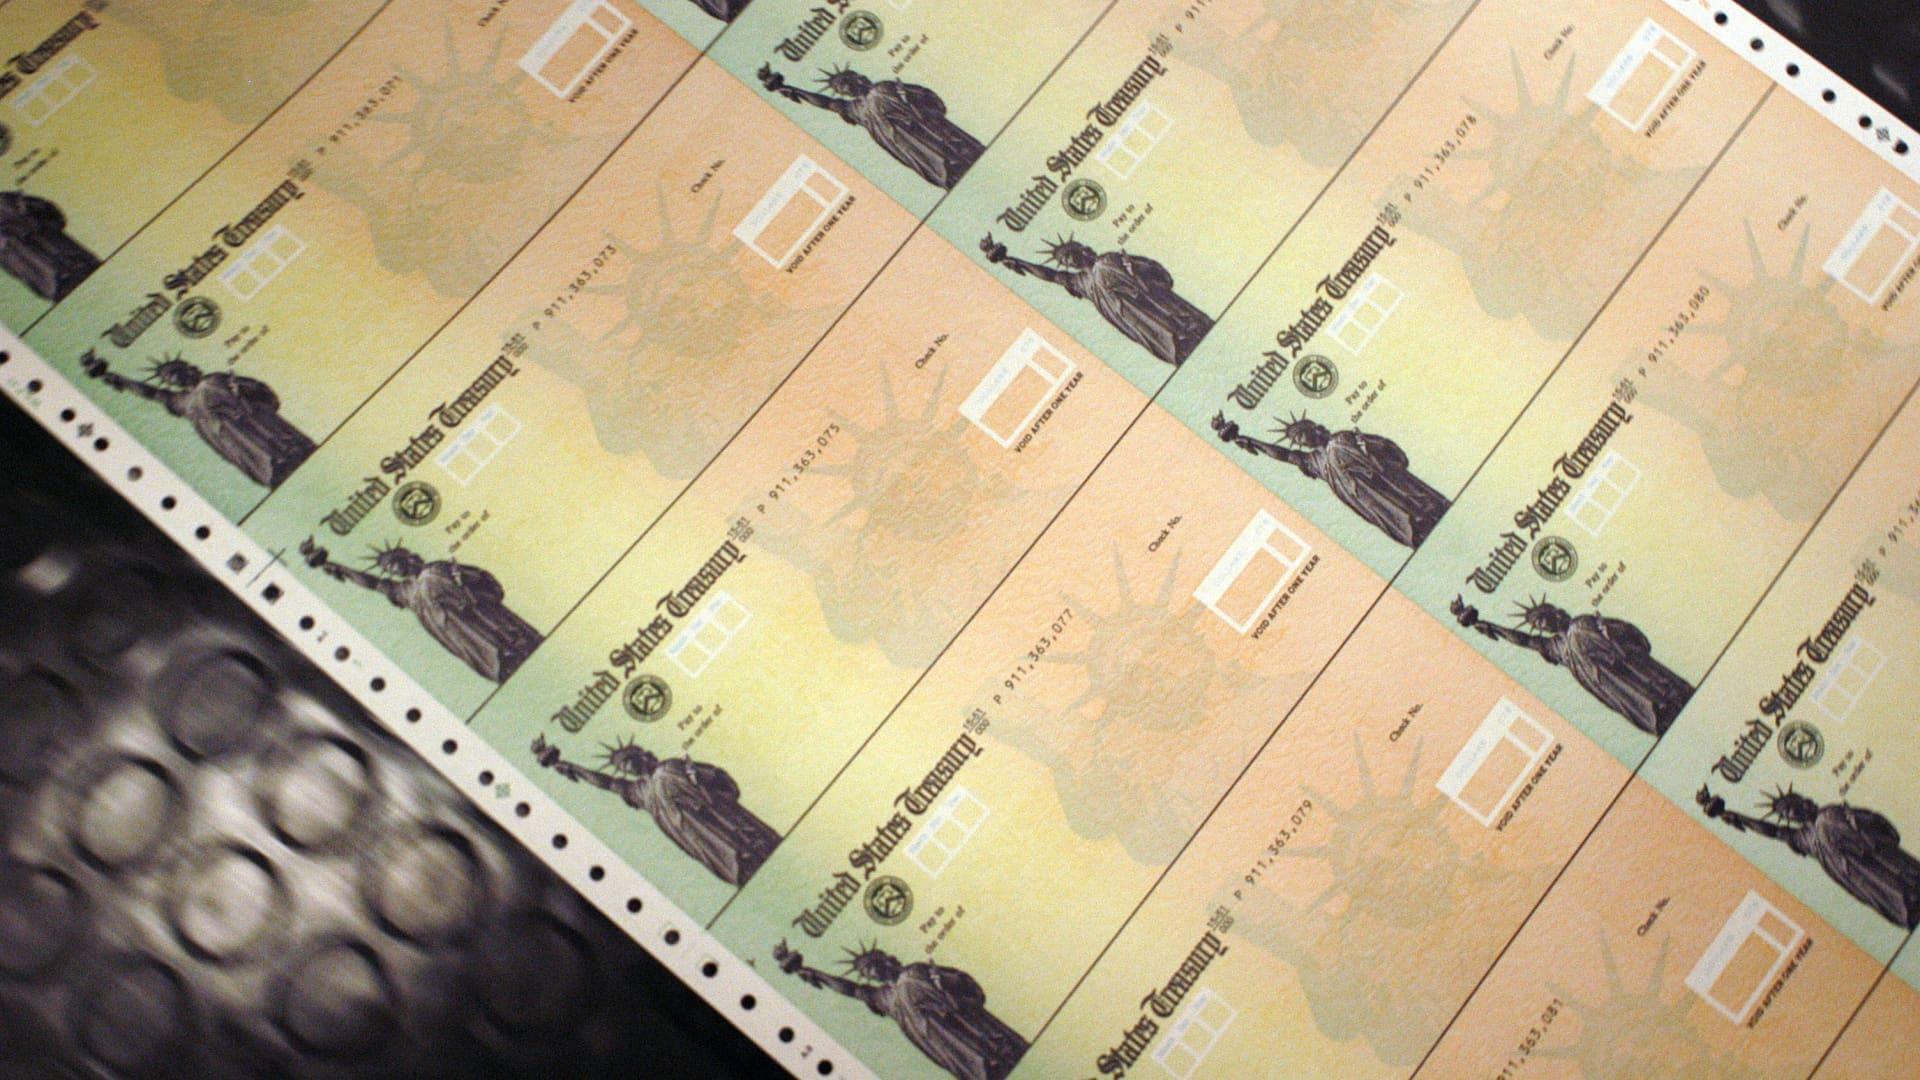 Blank Social Security checks are run through a printer at the U.S. Treasury printing facility February 11, 2005 in Philadelphia, Pennsylvania.